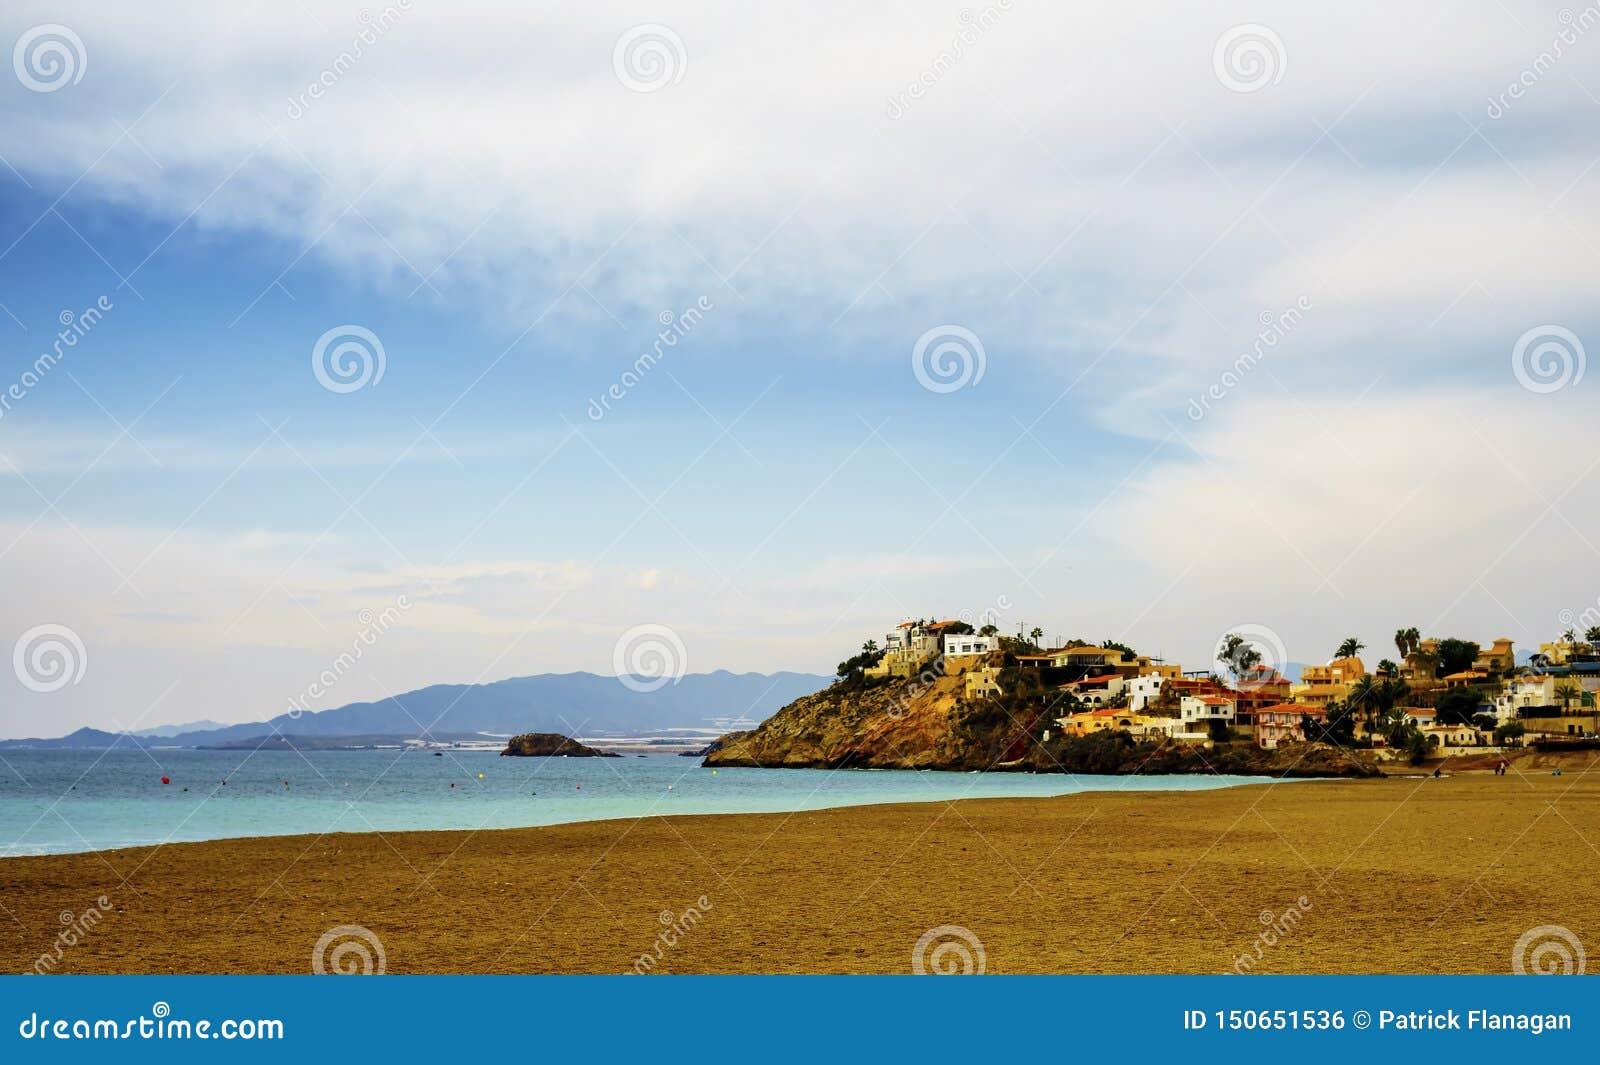 Un paysage marin de Bolnuevo, Murcie, Espagne